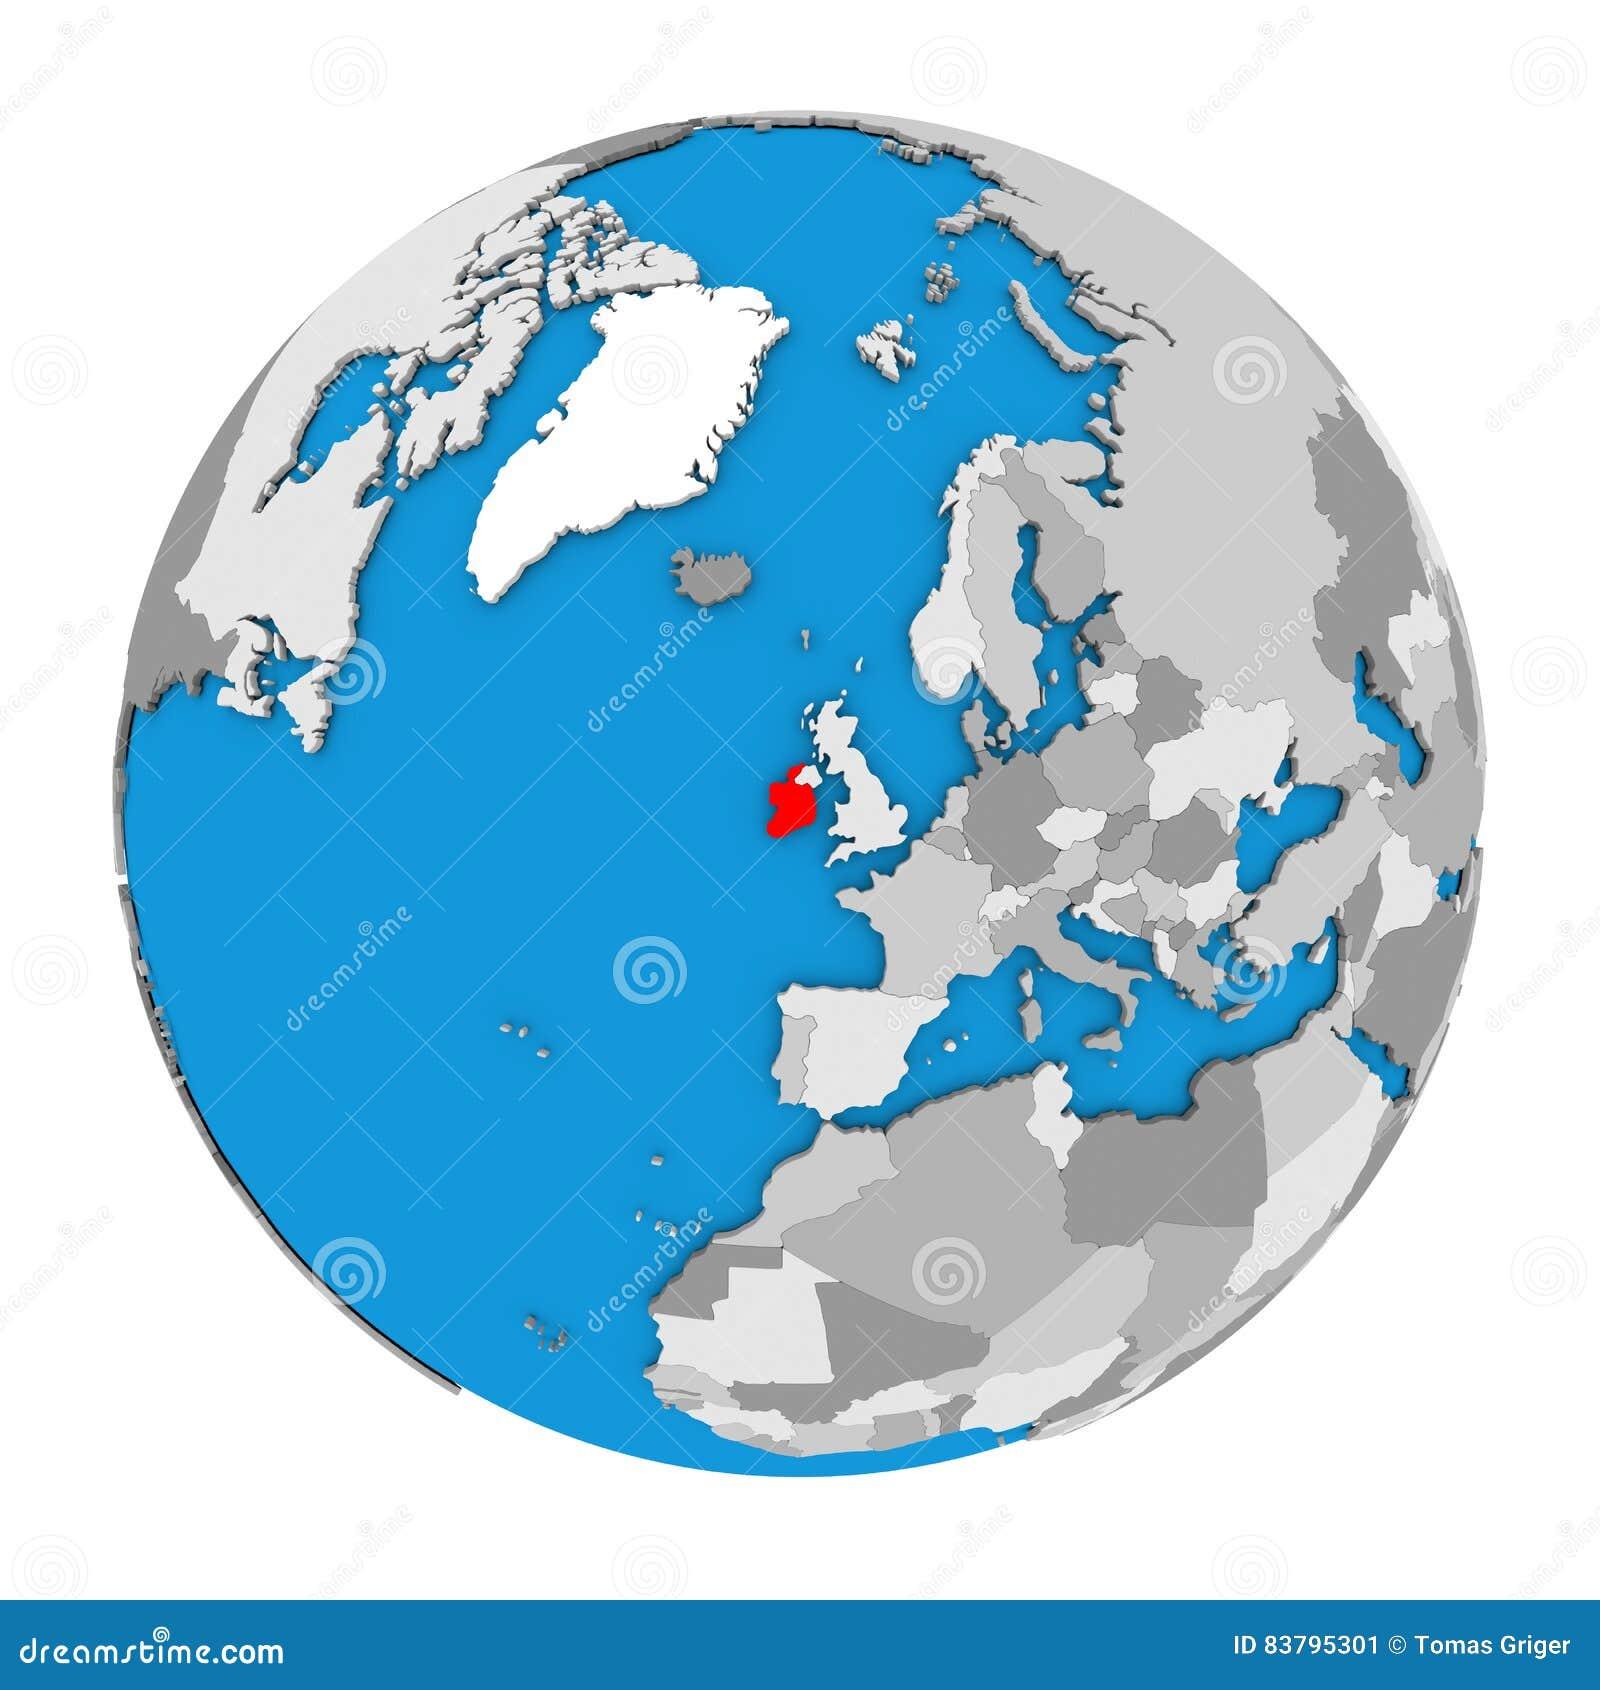 Map Of Ireland In The World.Ireland On Globe Stock Illustration Illustration Of Isolated 83795301